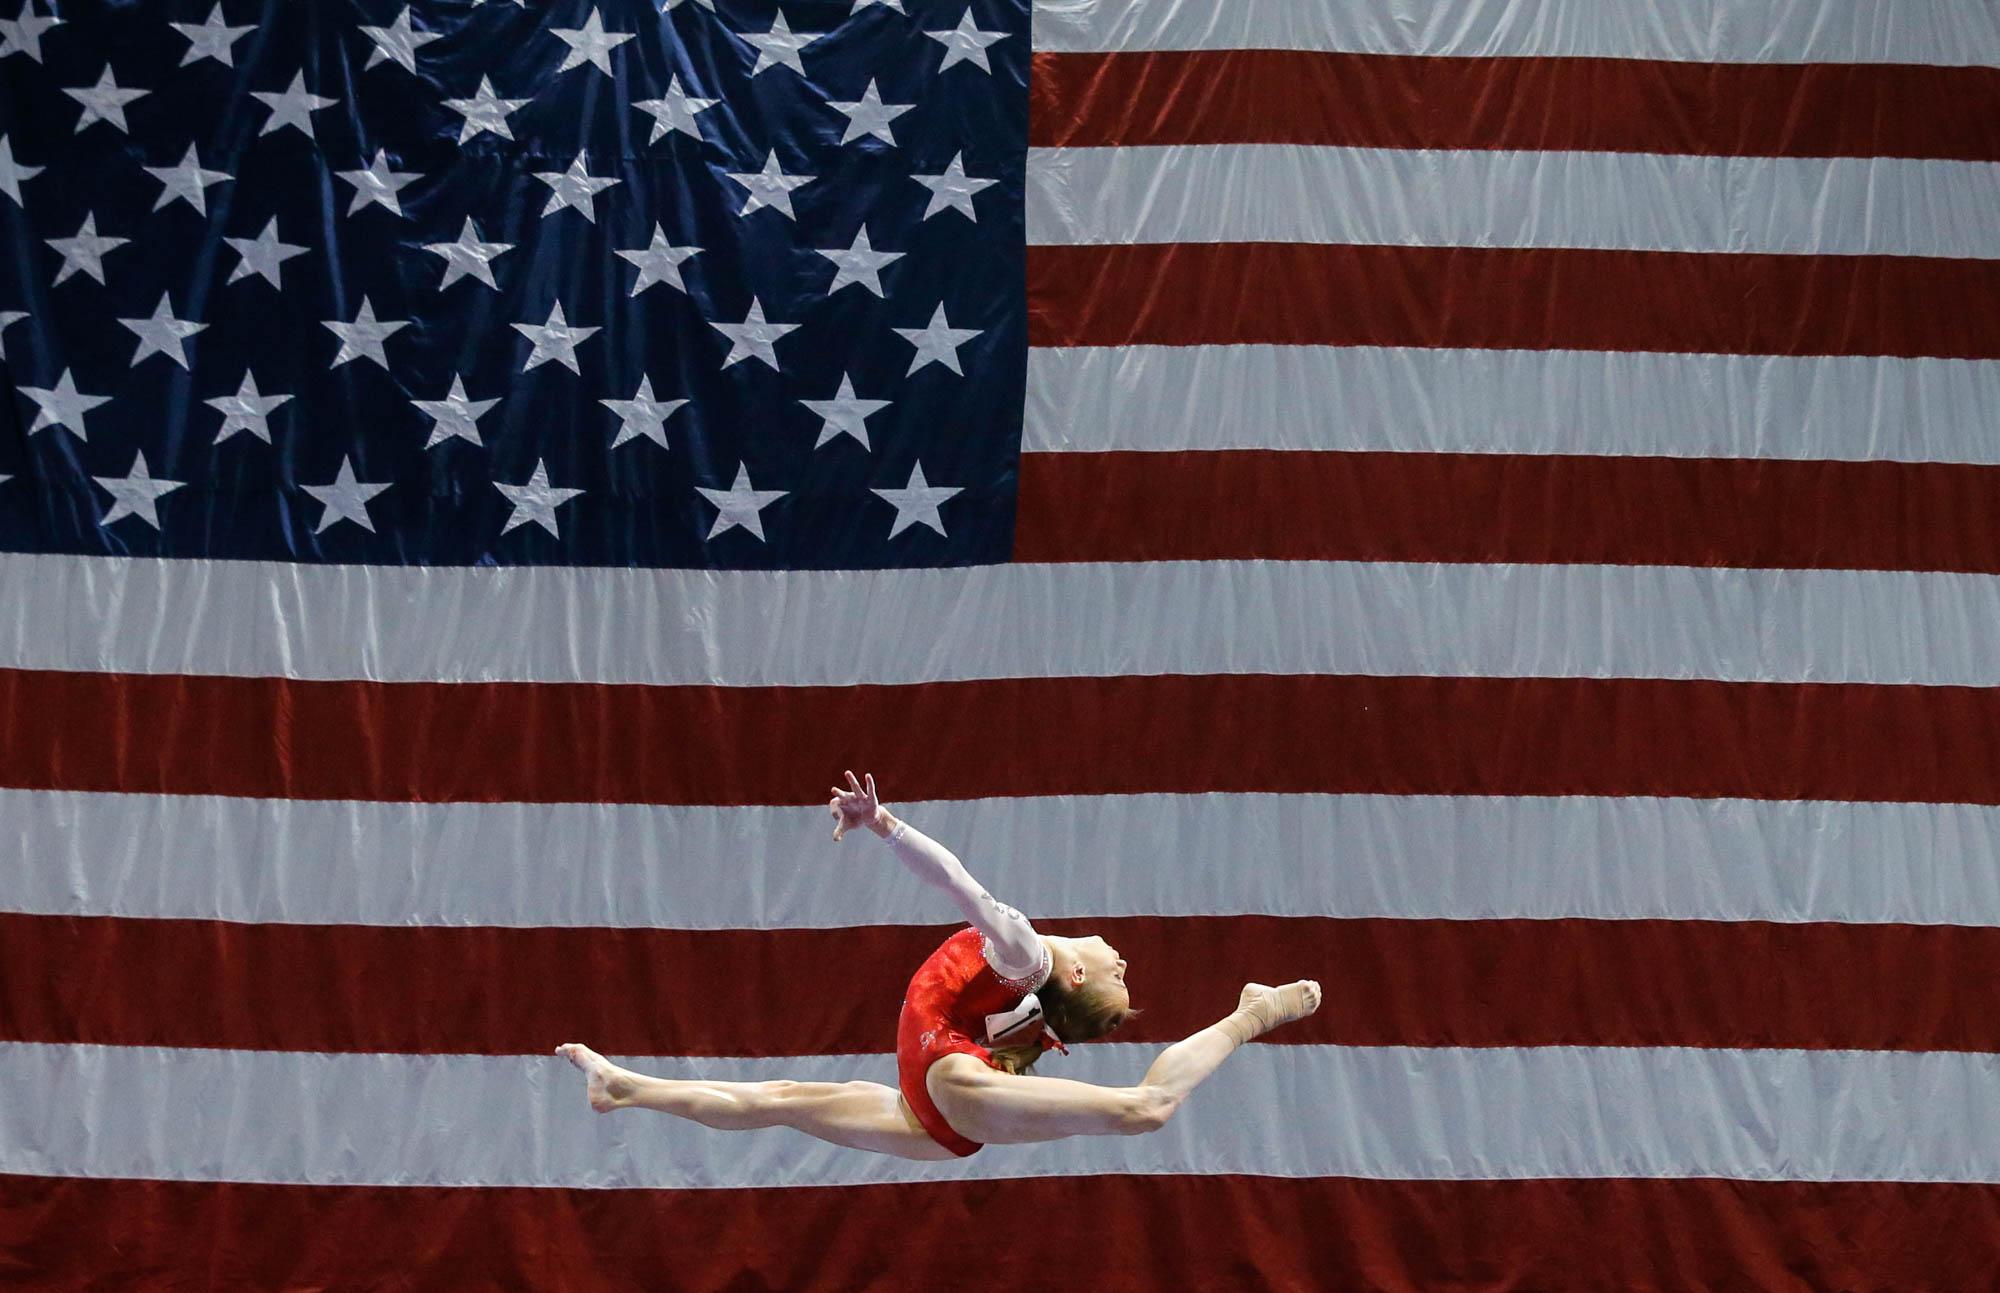 Madison Kocian doing split leap with U.S. flag in background (© AP Images)